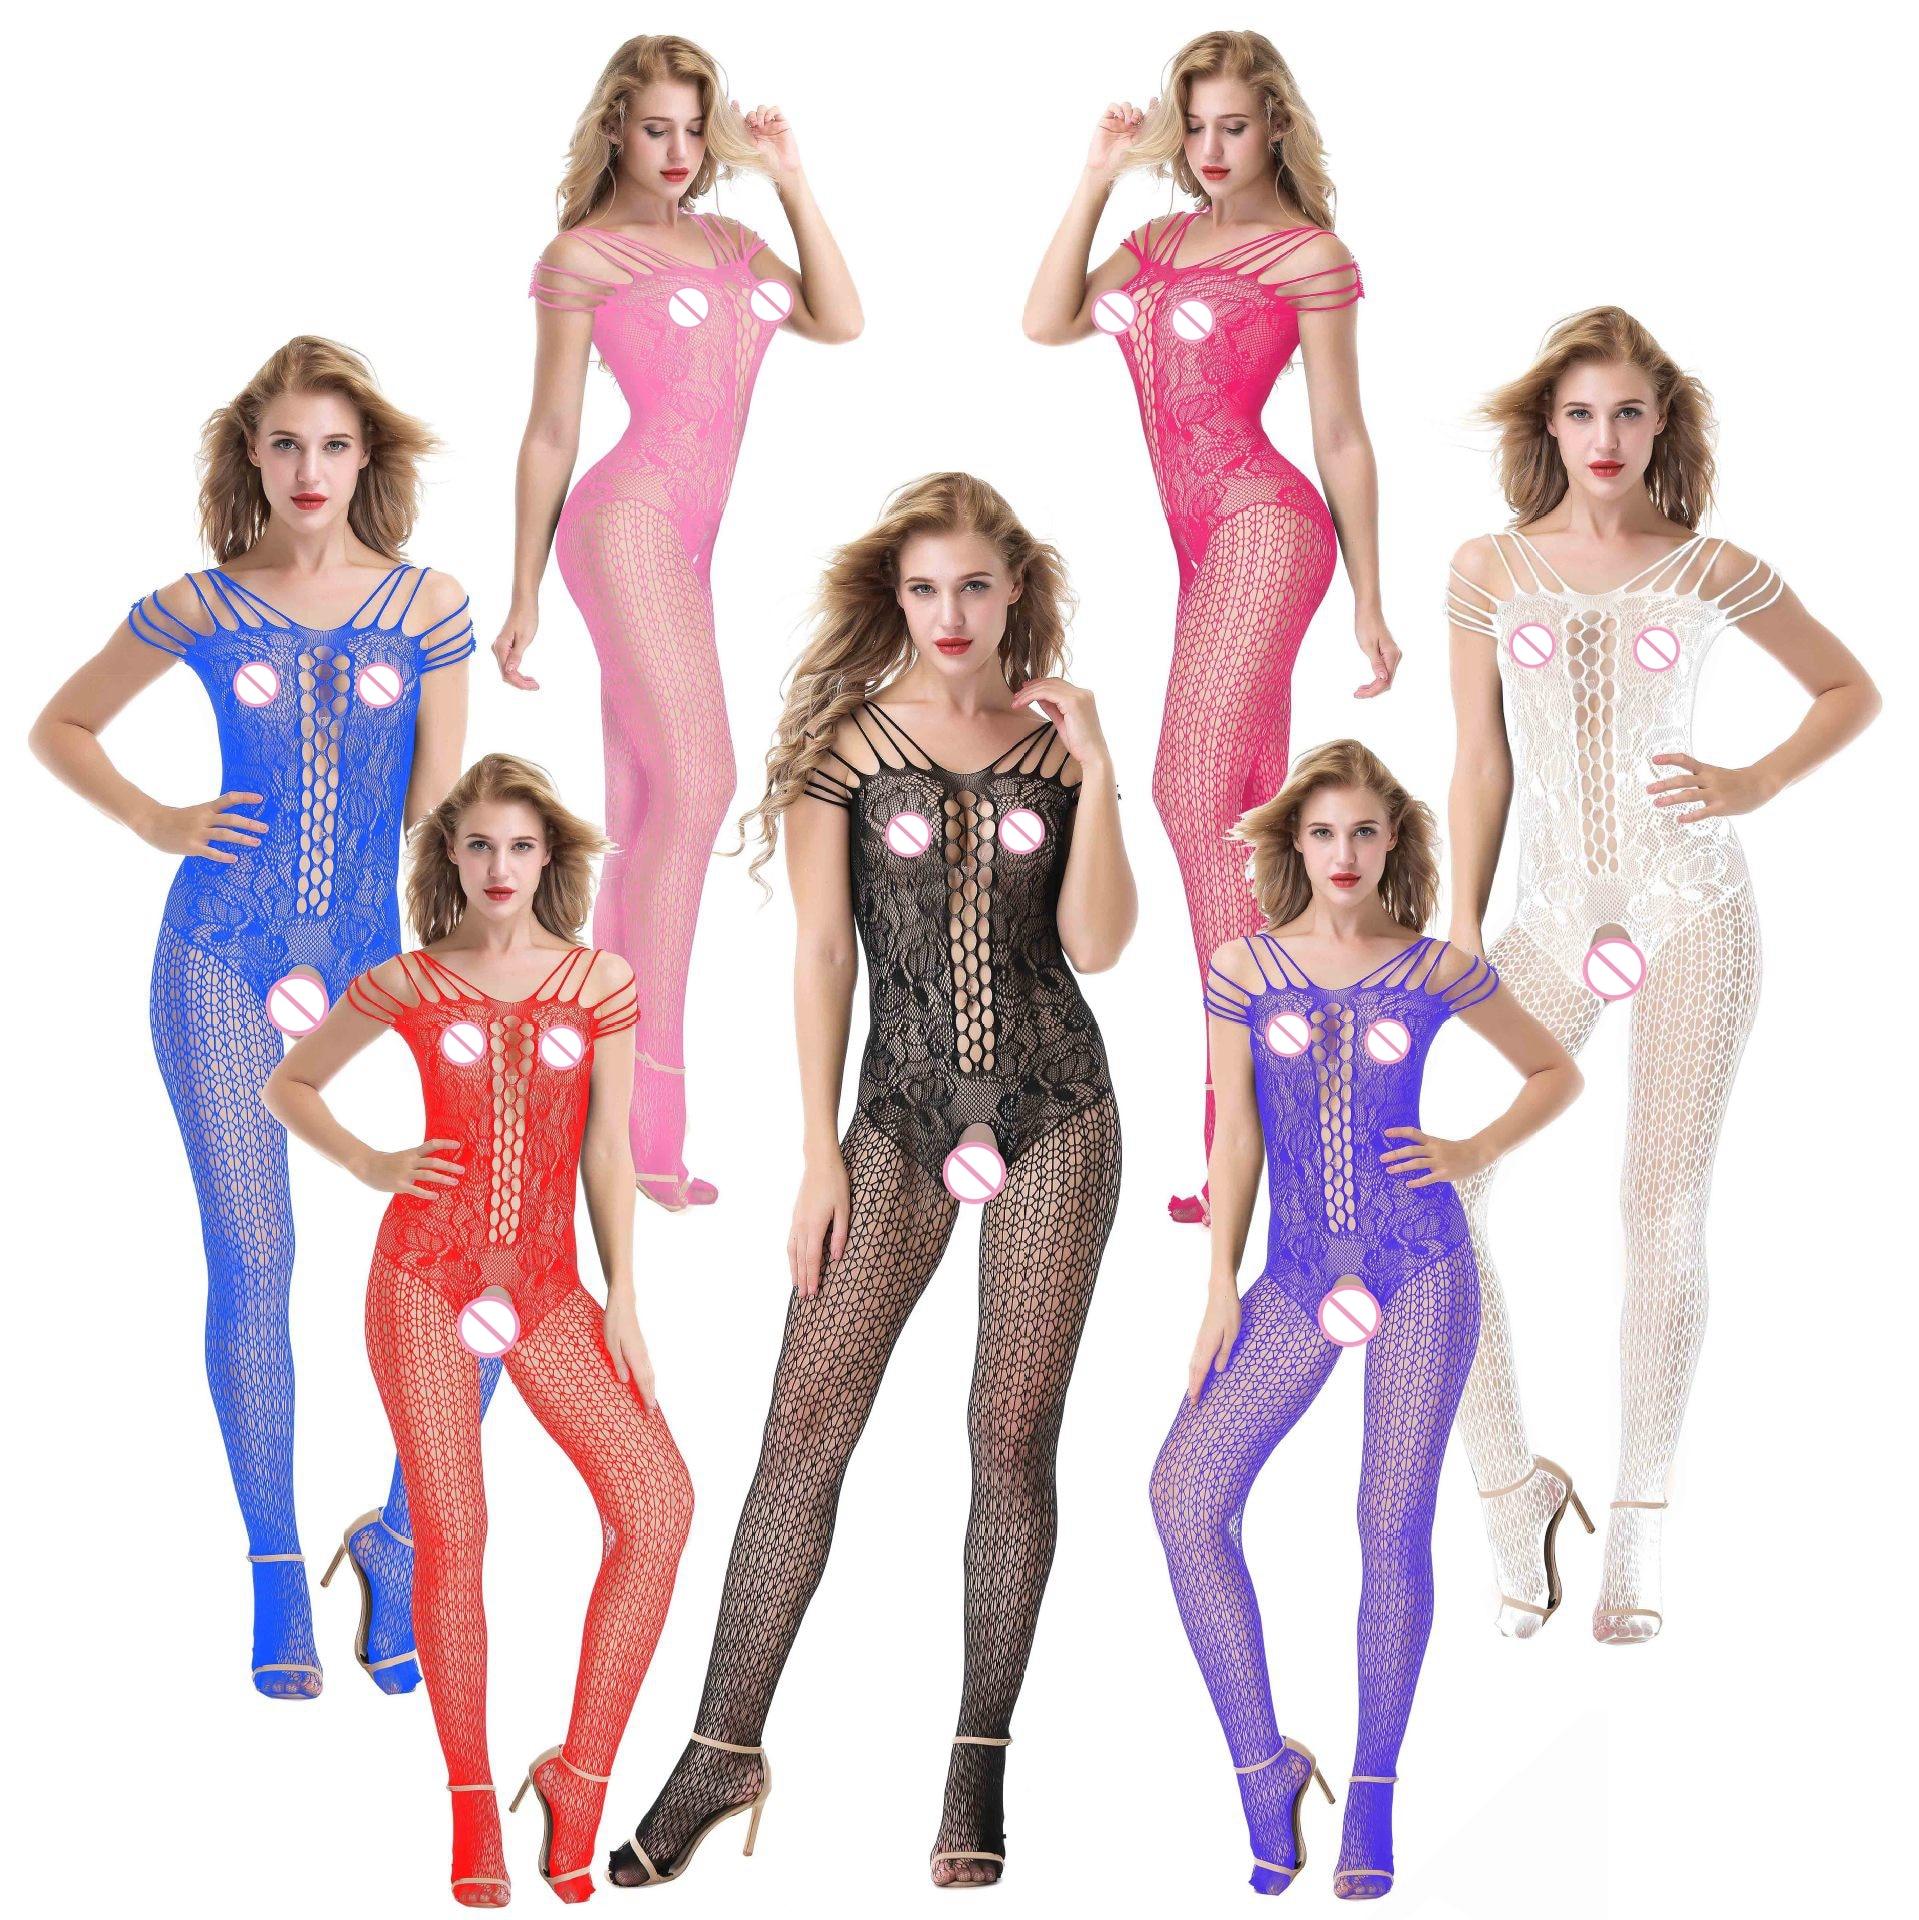 Woman Sexy Lingerie Hot Costumes Sexy Dress Fancy Underwear Erotic Lingerie Sleepwear Sex Products for Women Teddy Bodystocking